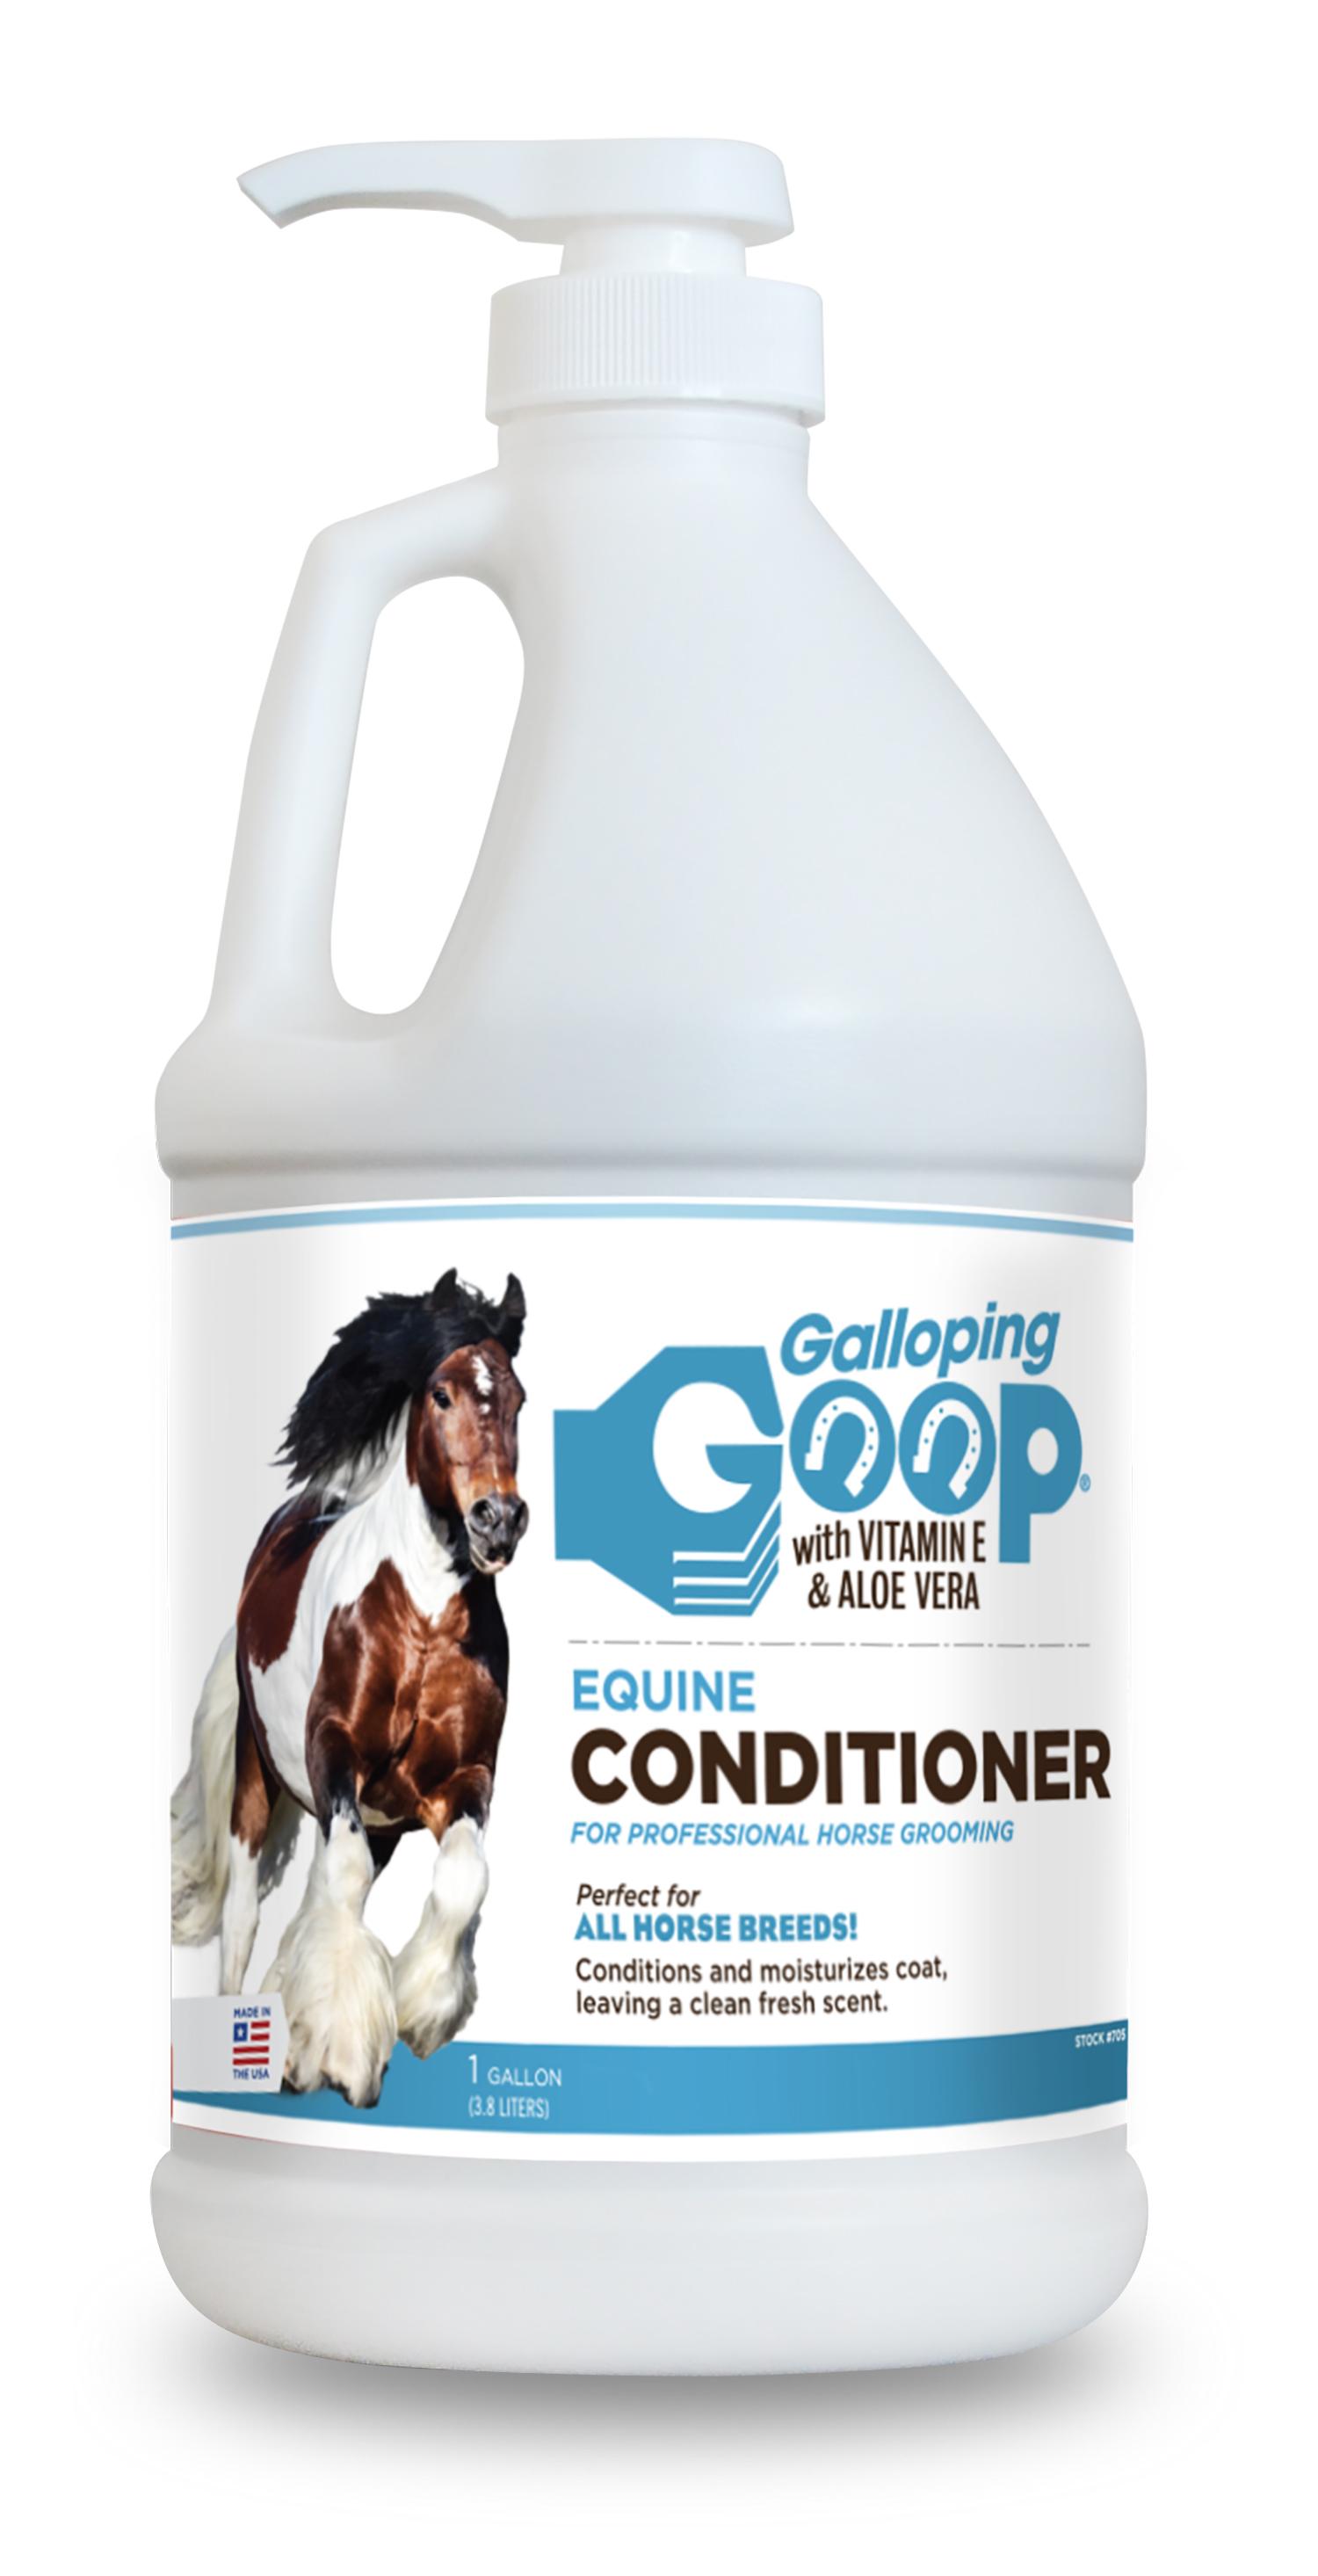 Moms-Goop-Galloping-705-Conditioner1Gallon.jpg